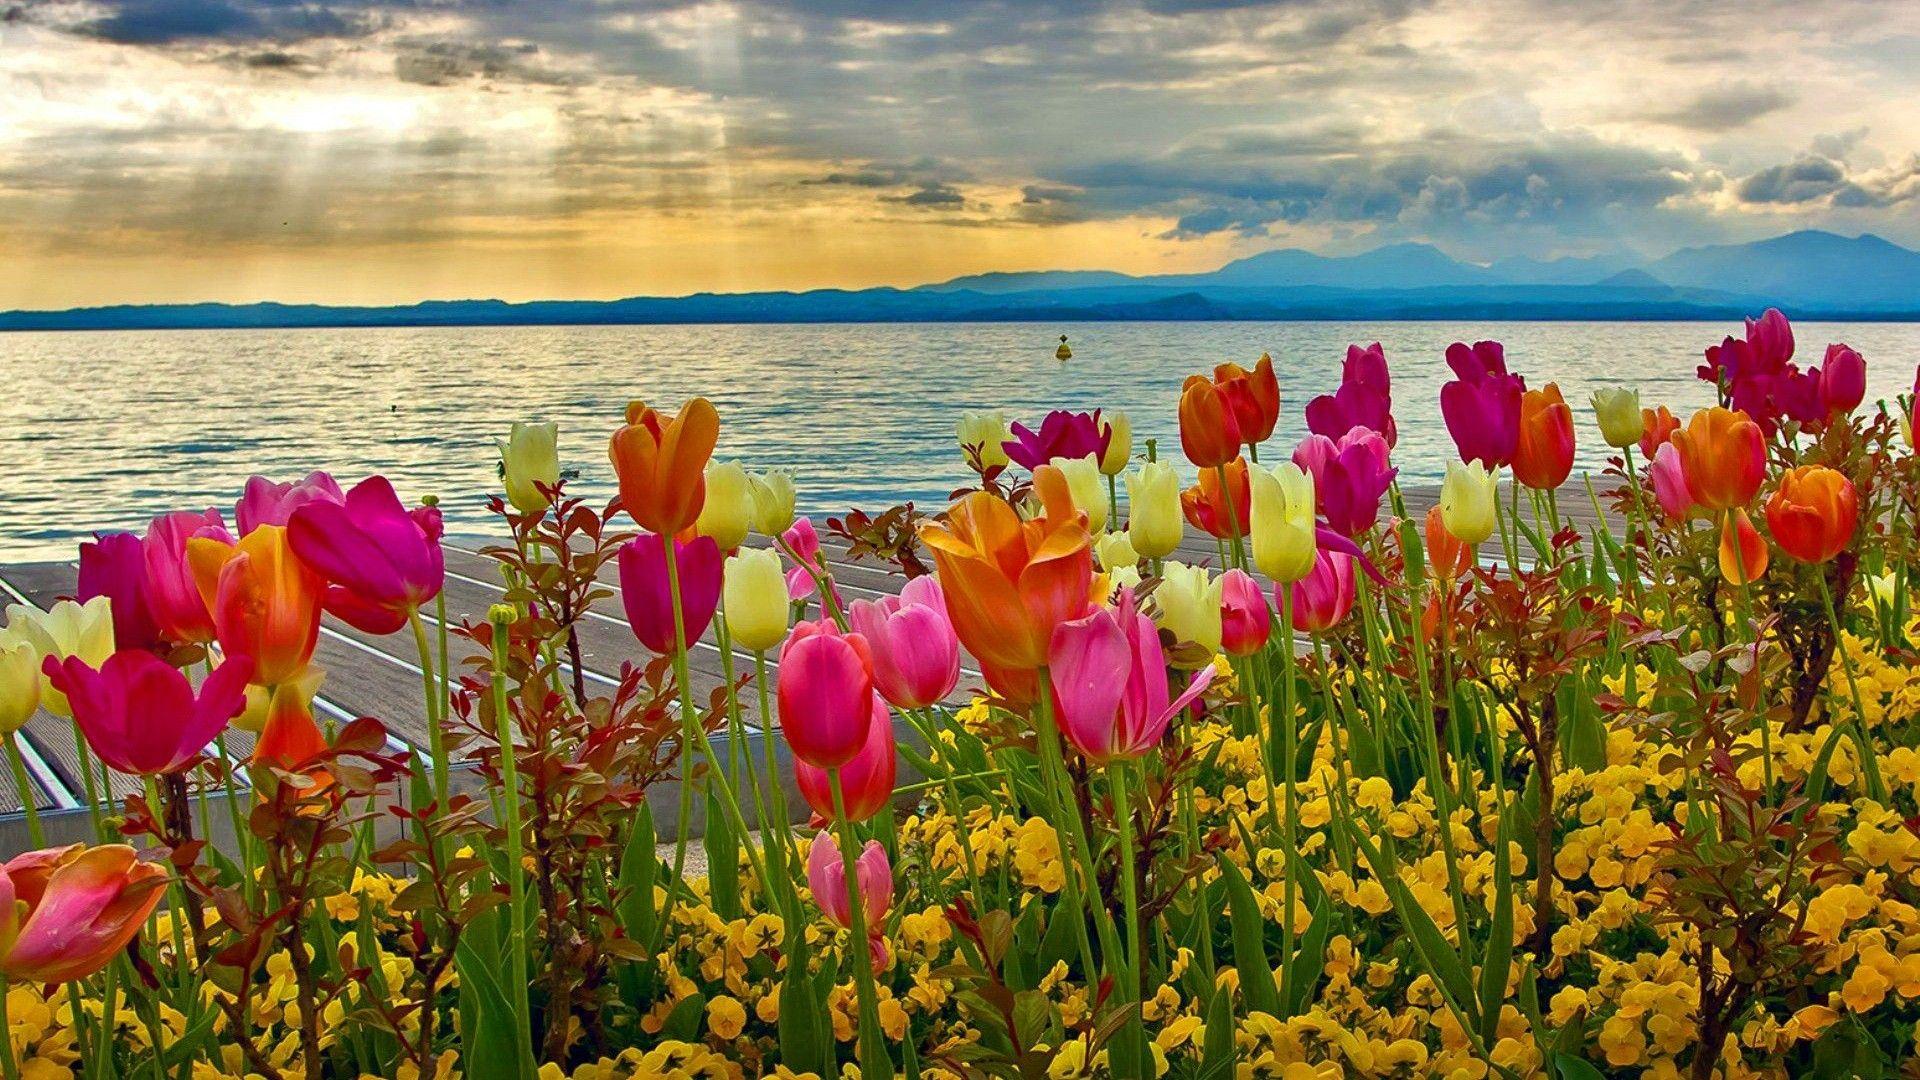 Spring Nature Desktop Backgrounds Hd Best Hd Wallpapers Spring Desktop Wallpaper Spring Flowers Wallpaper Spring Wallpaper